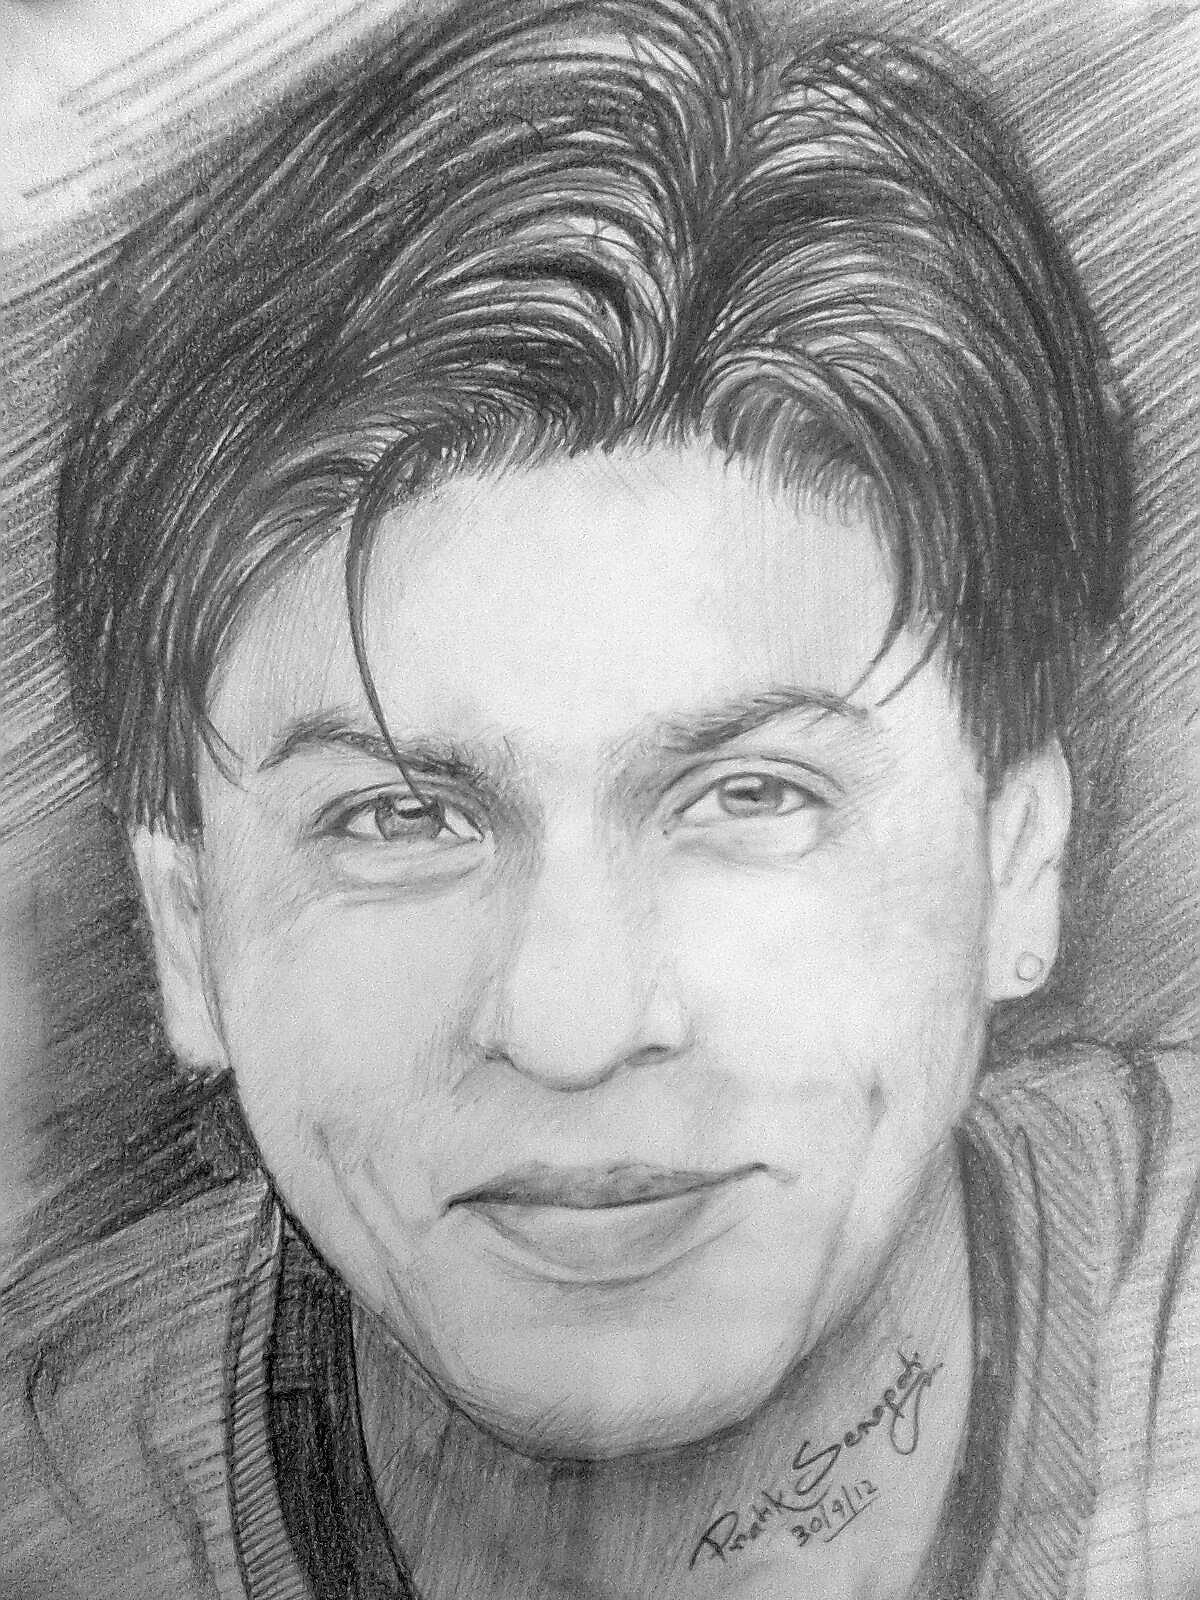 Shahrukh Khan Pencil Drawing